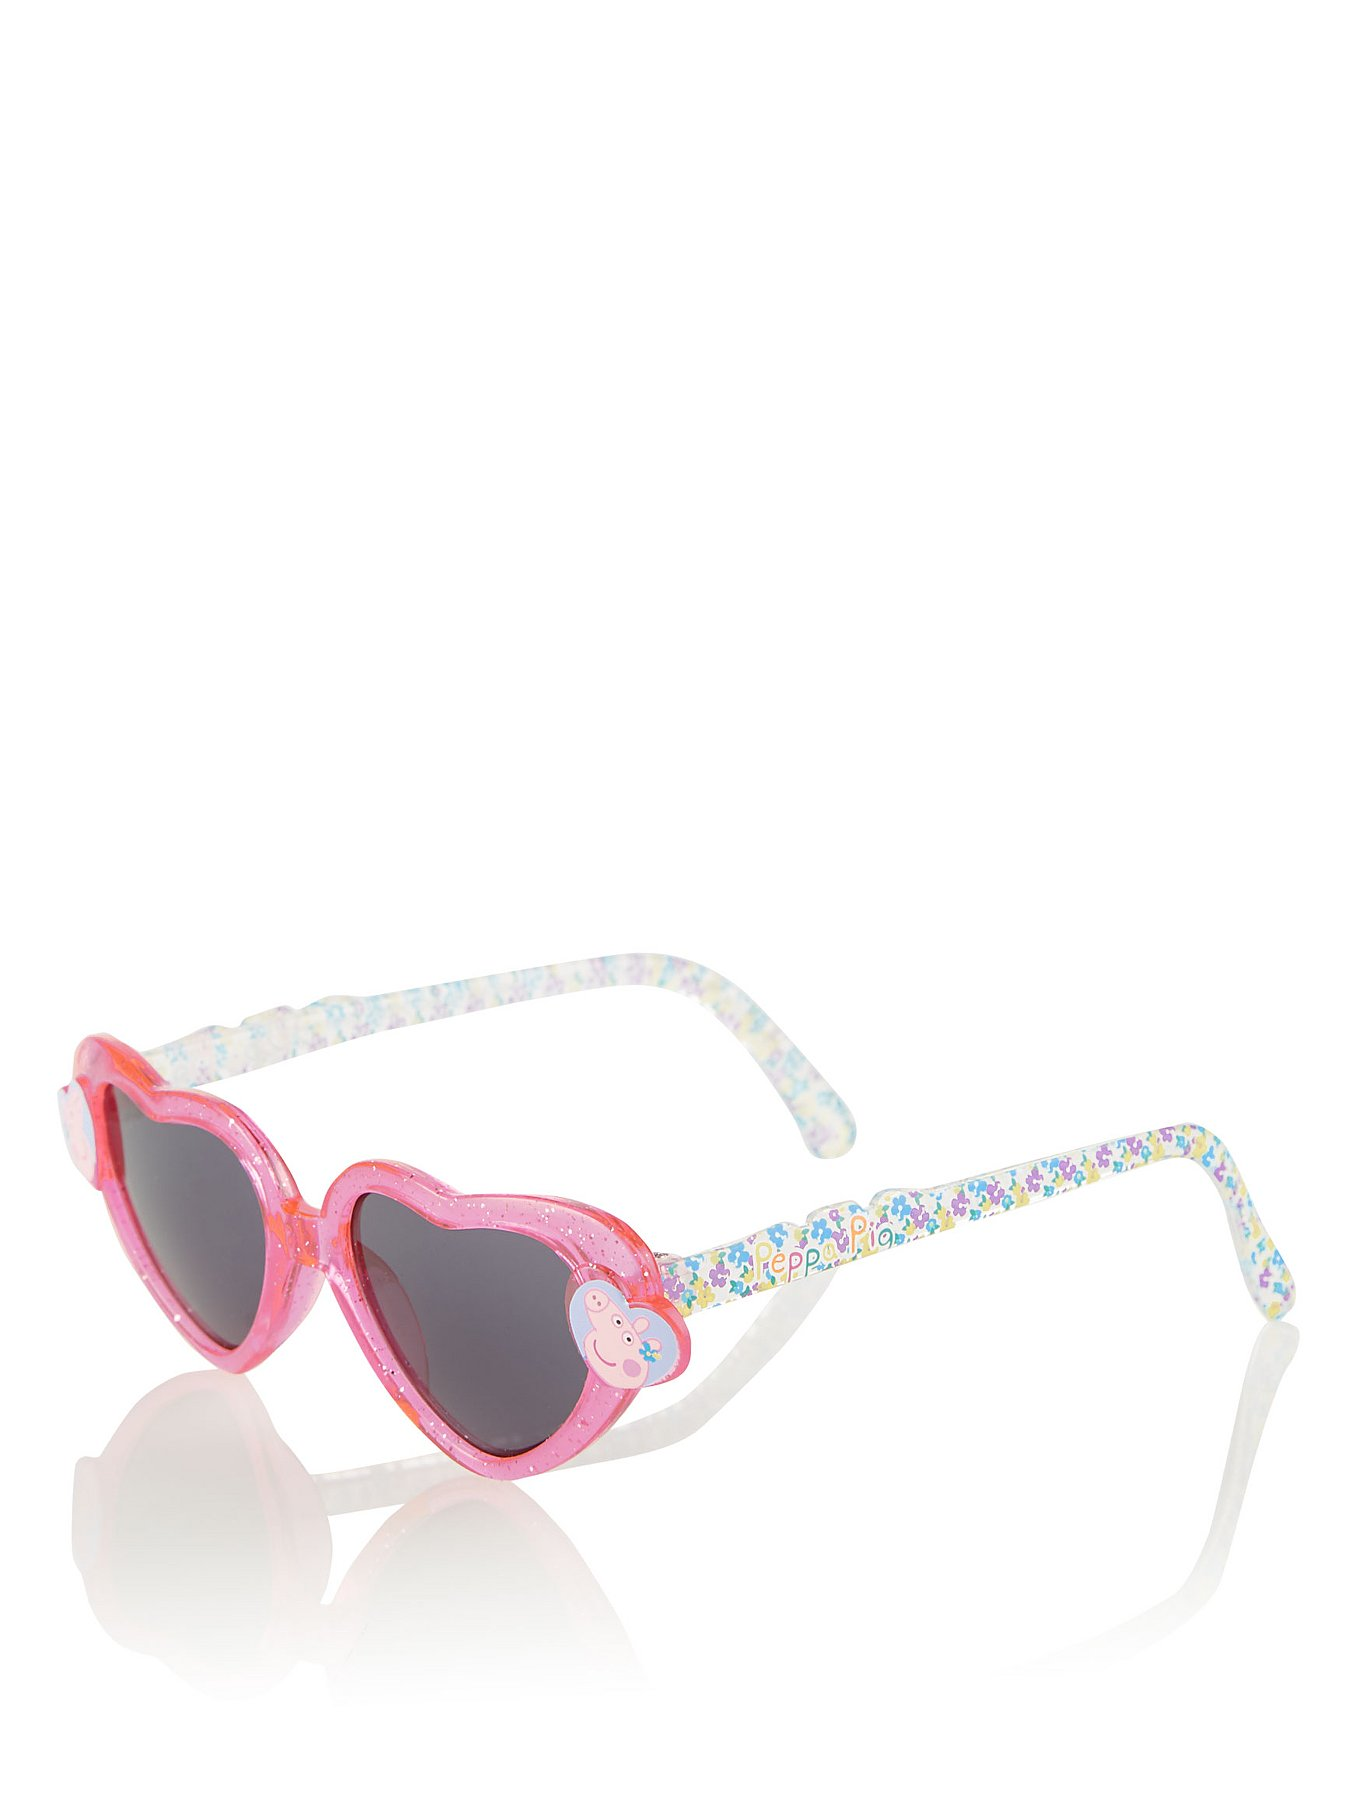 Peppa Pig Sparkly Sunglasses